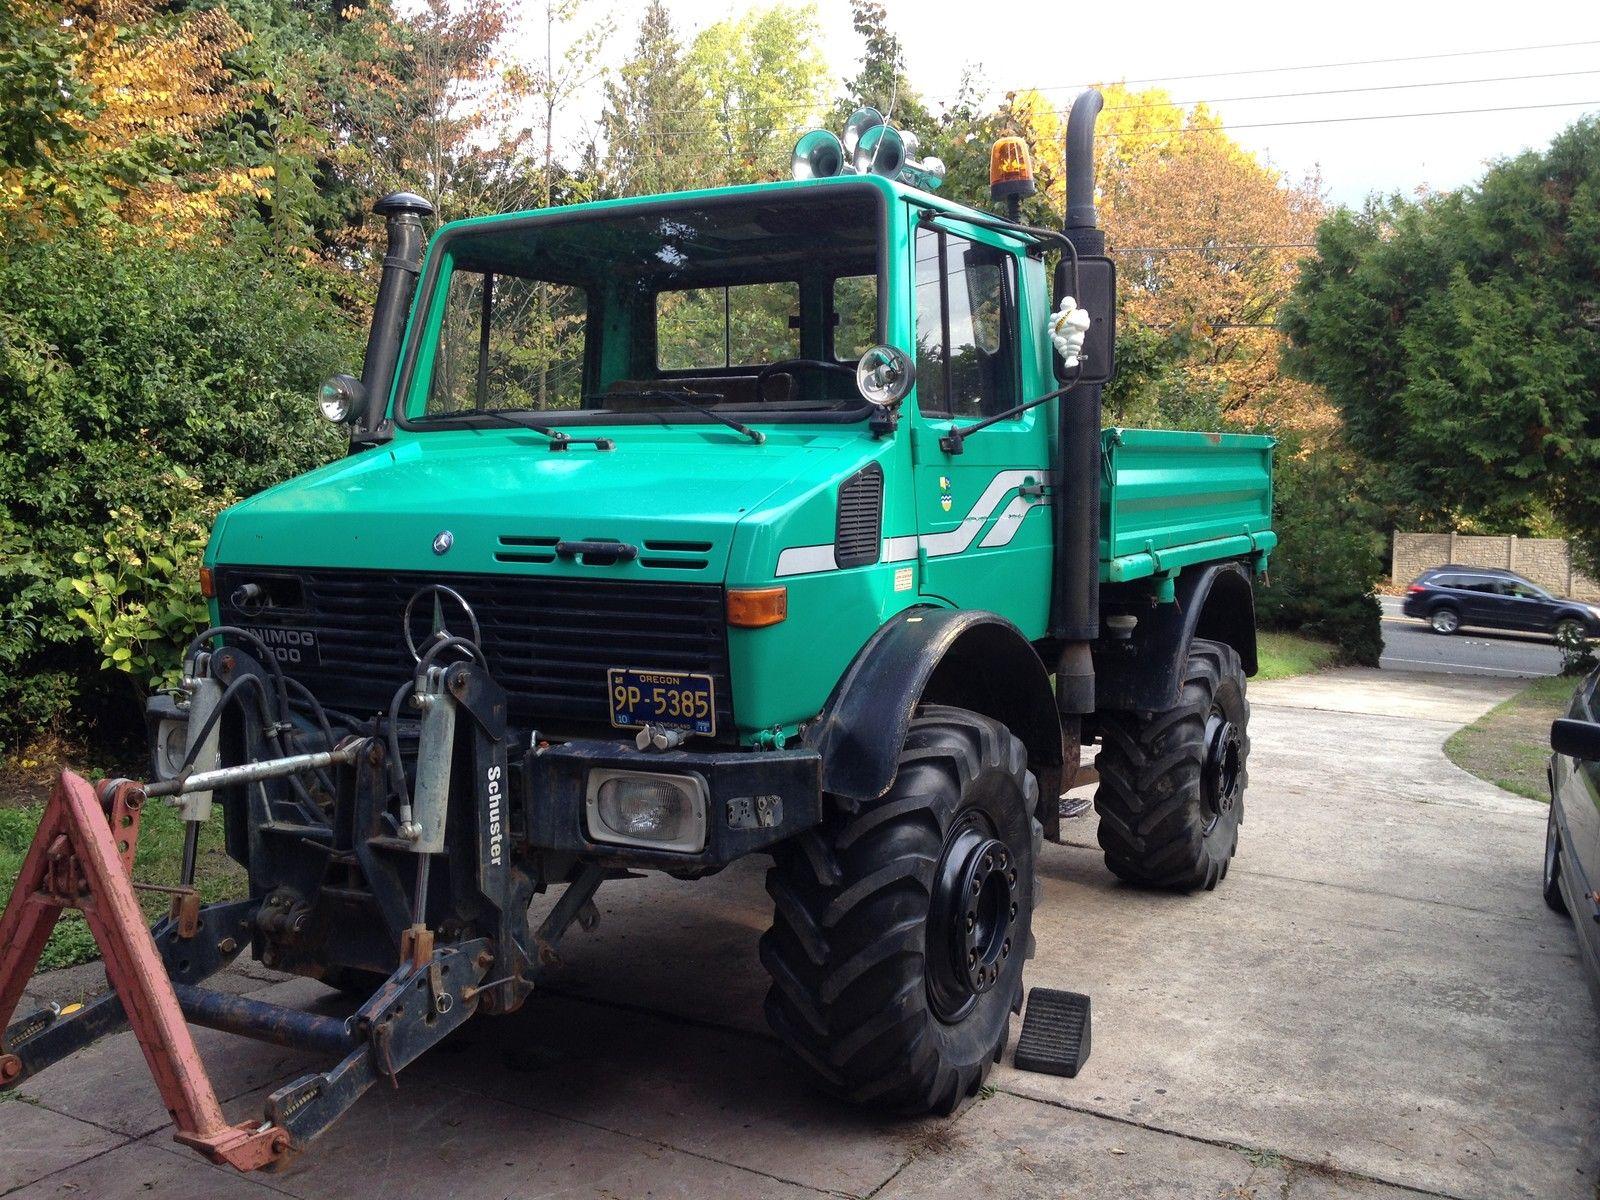 Unimog U1500 Ag For Sale In Portland Oregon United States